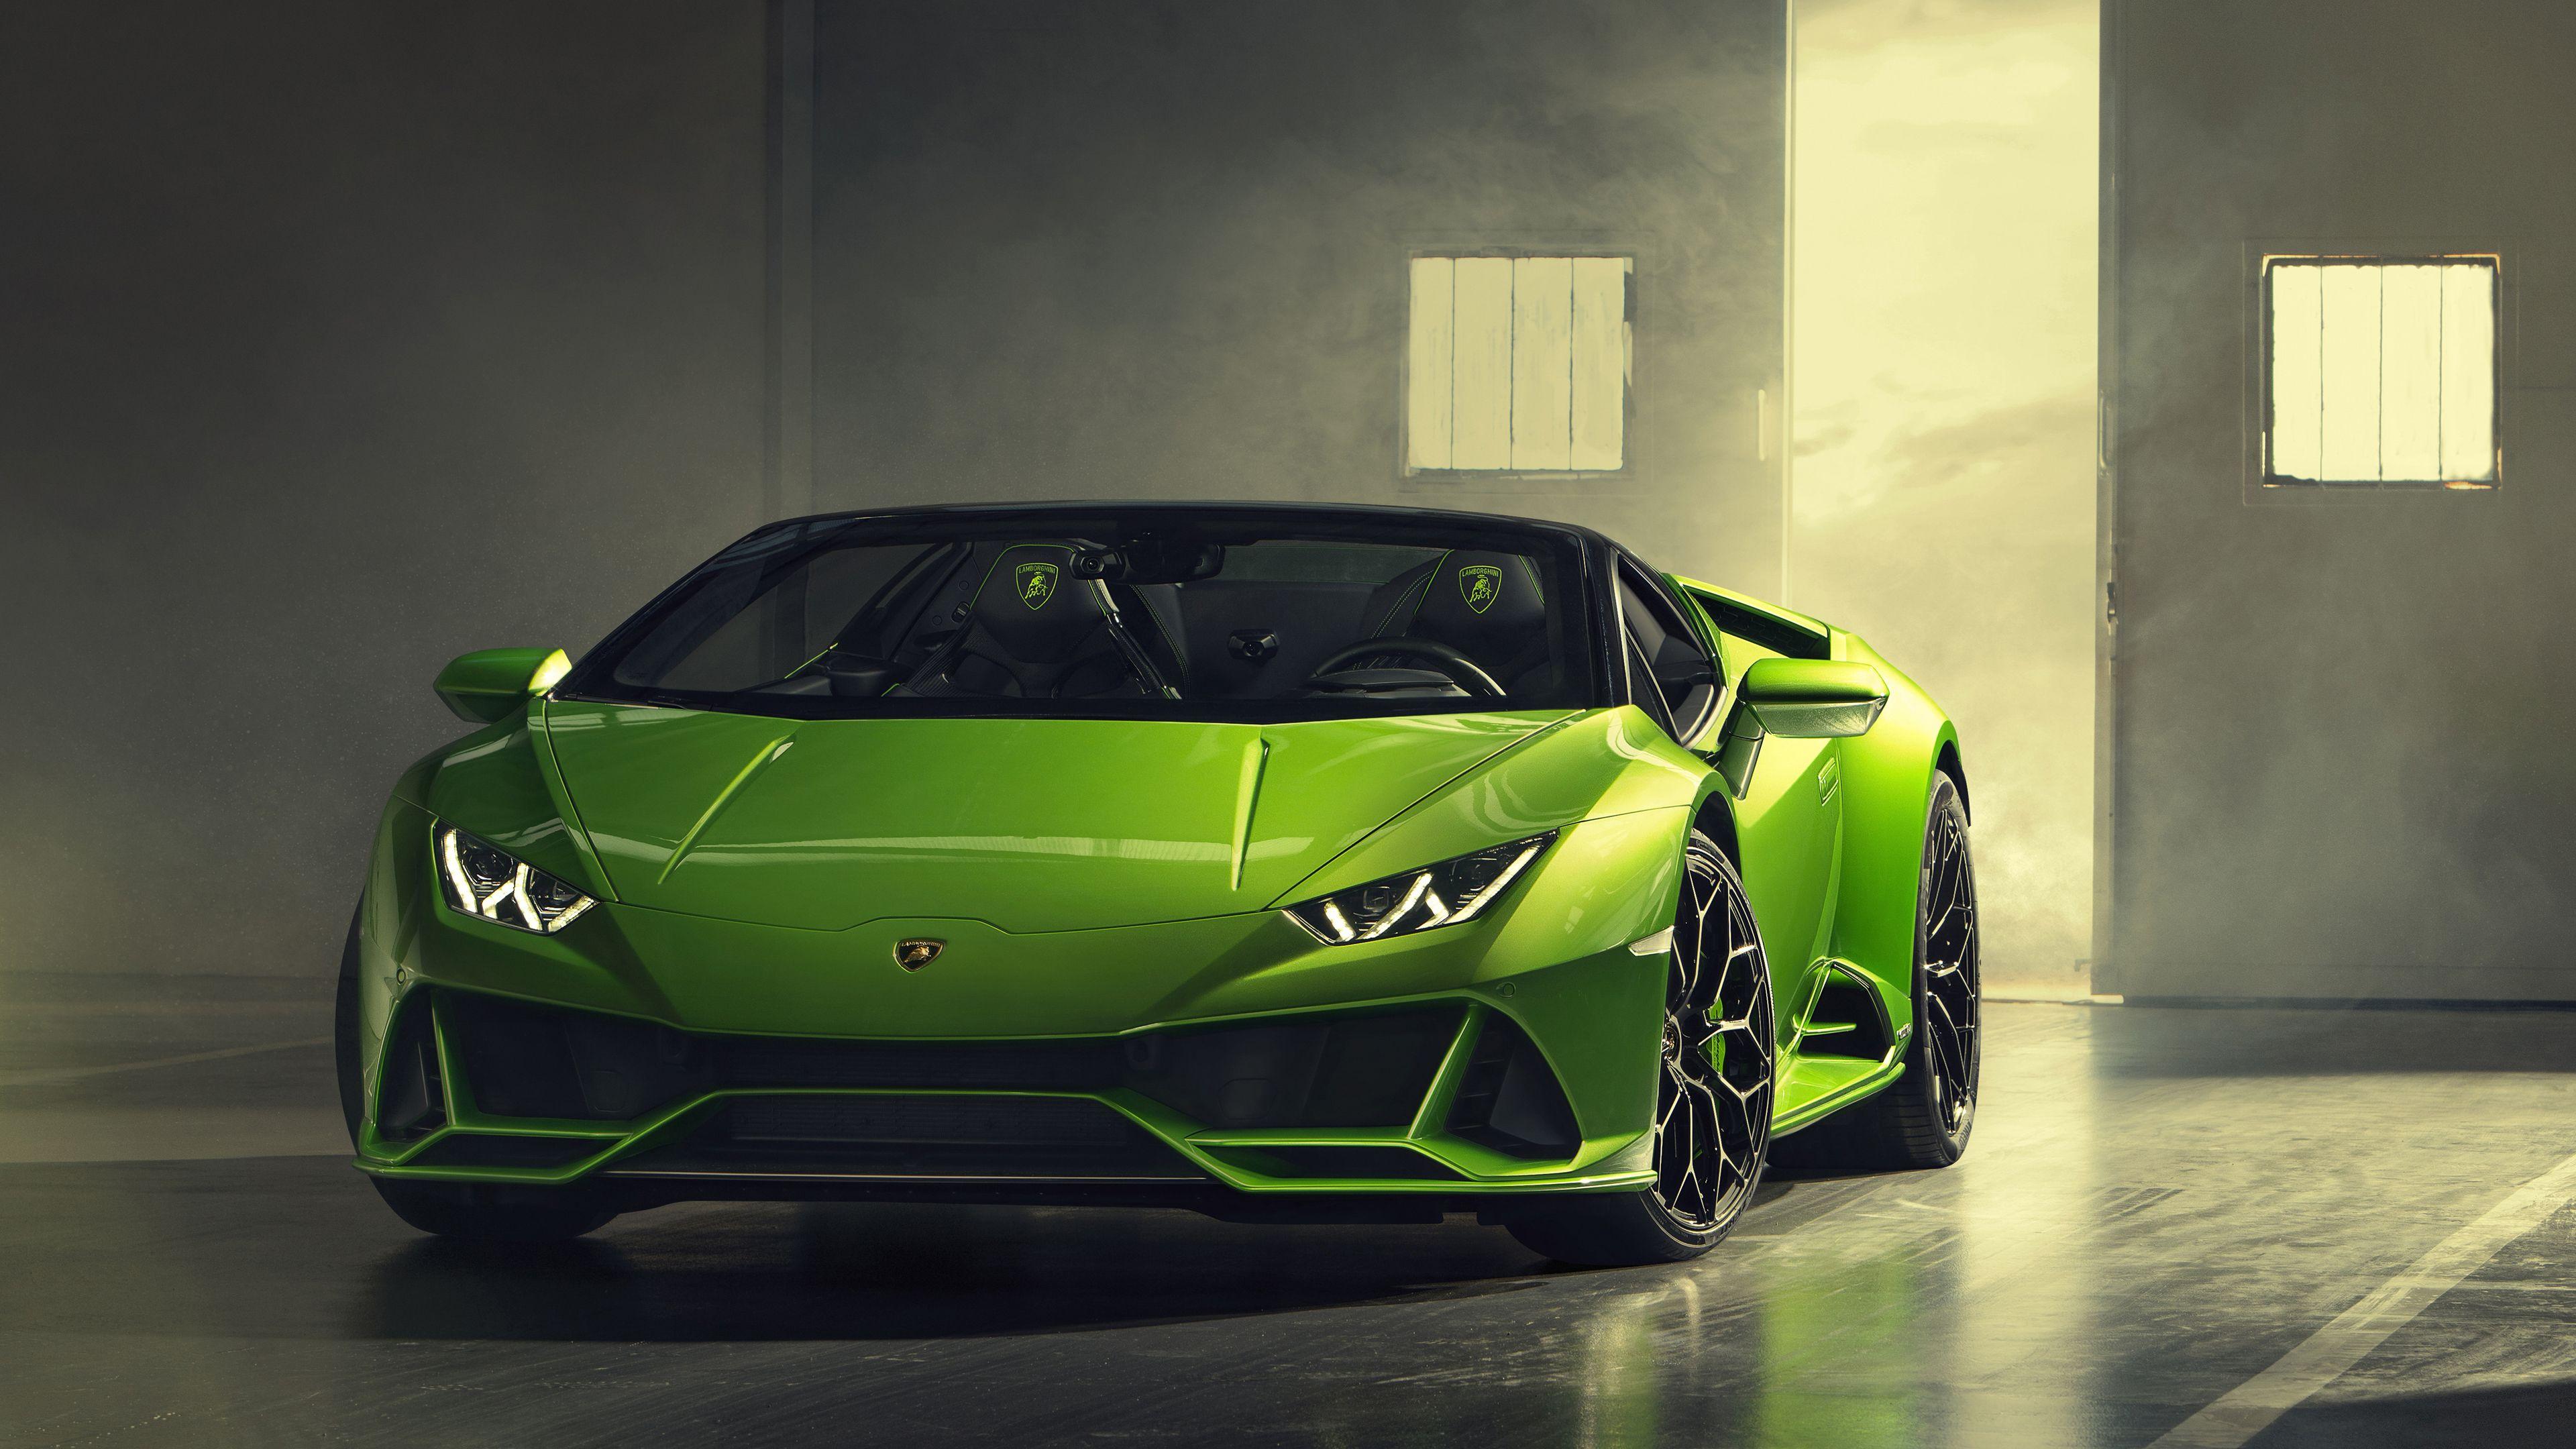 2019 Lamborghini Huracan Evo Spyder Front 4k lamborghini wallpapers, lamborghini…